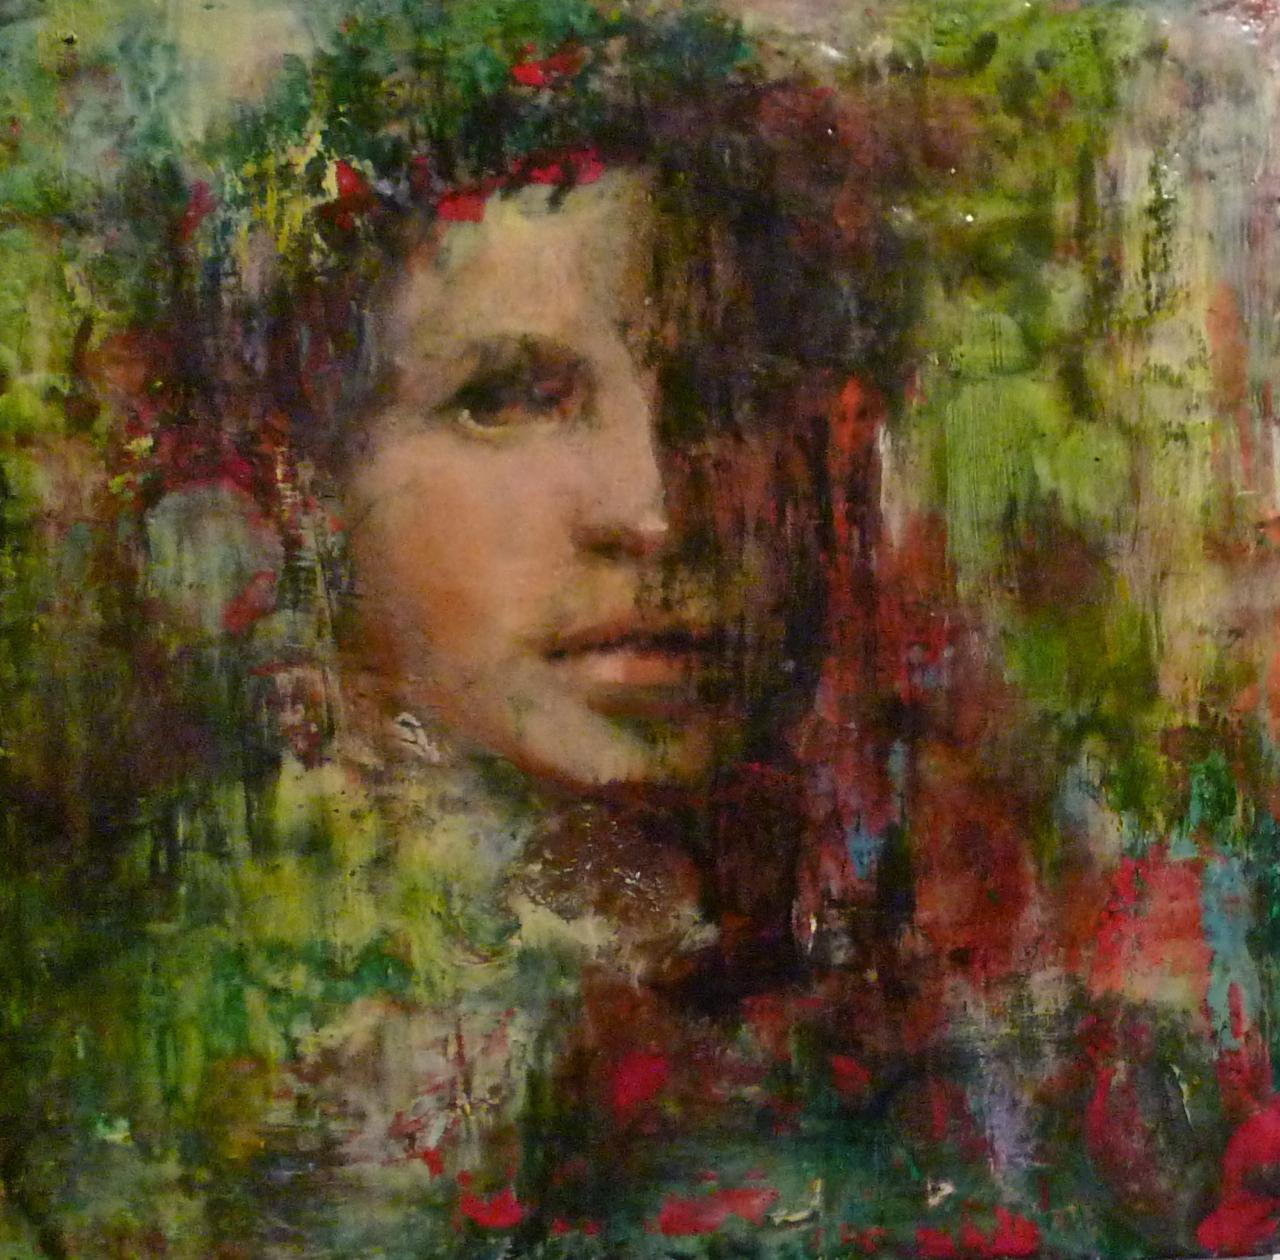 60 Years of Making Art: encaustic over oil